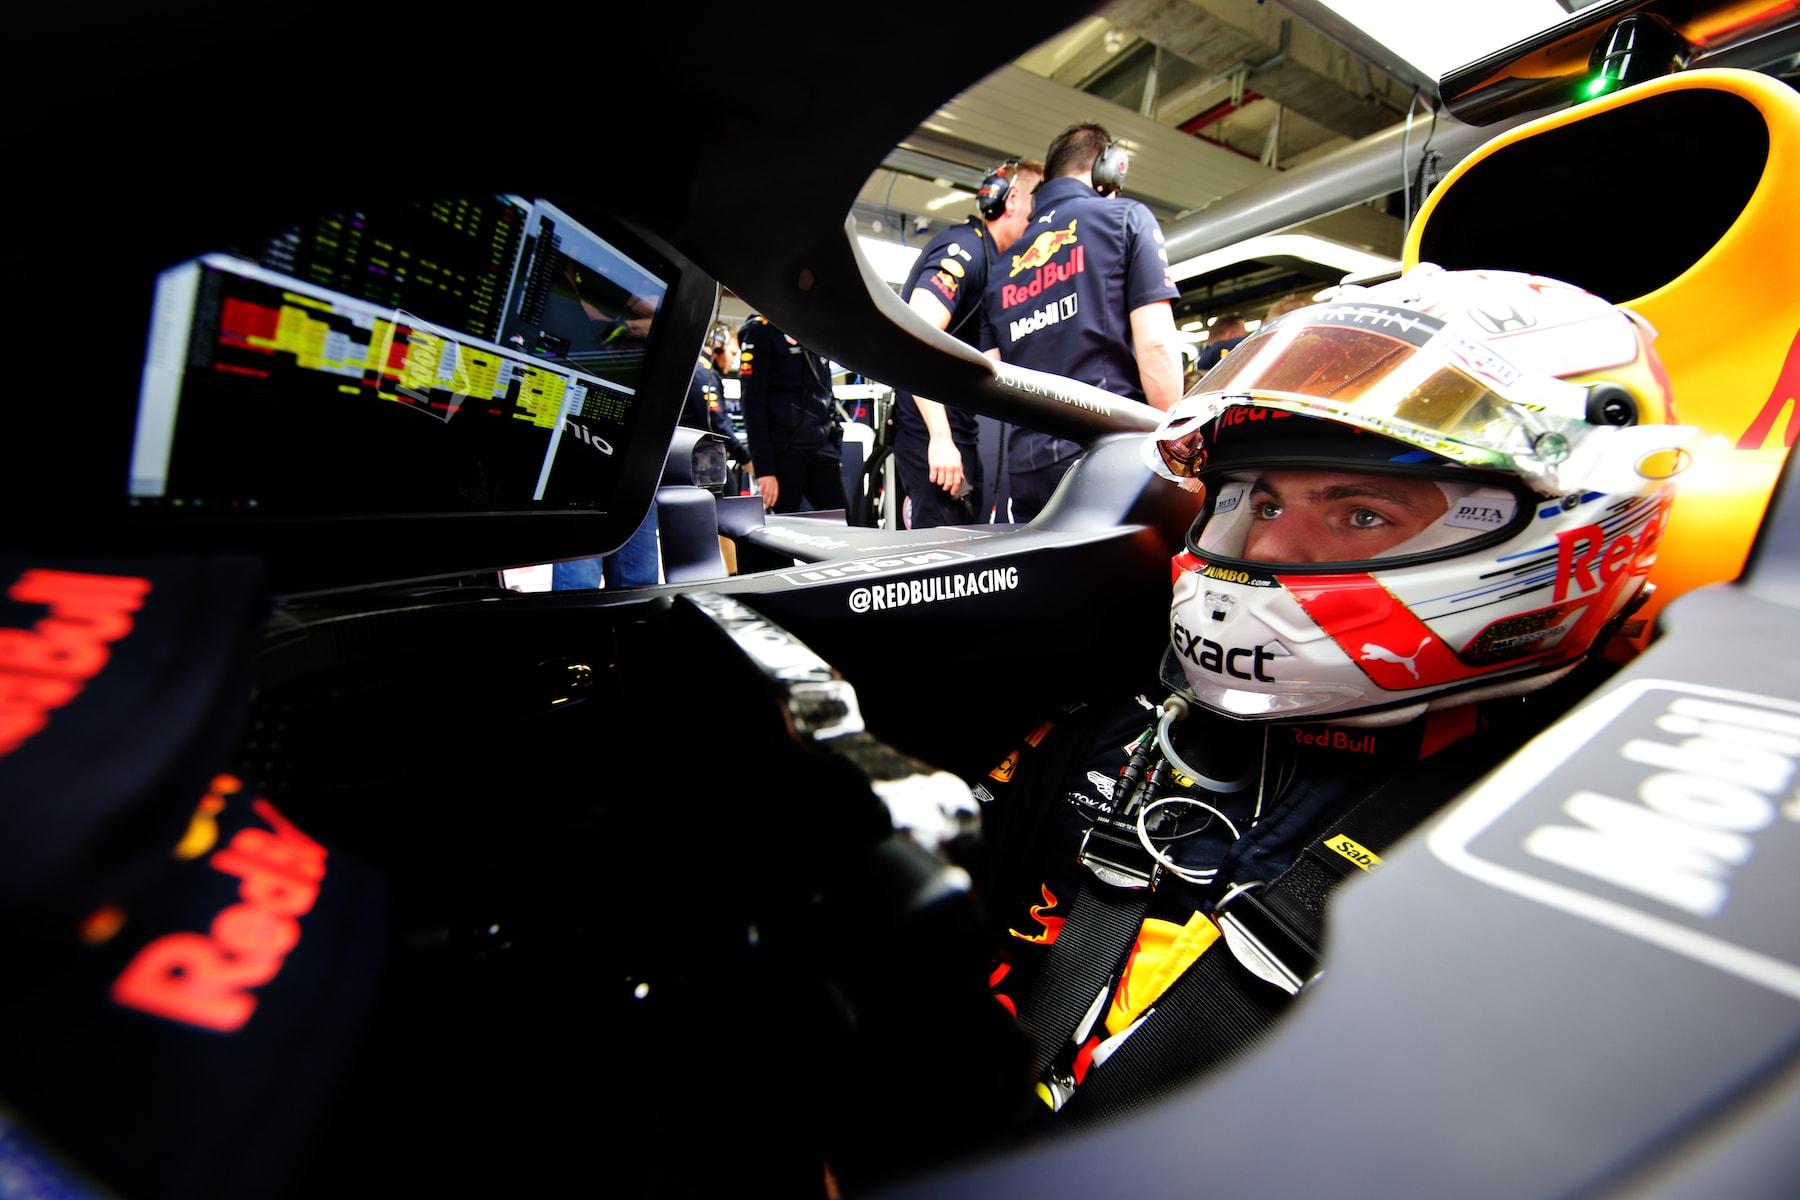 1 2019 Max Verstappen | Red Bull RB15 | 2019 Chinese GP FP1 2 copy.jpg